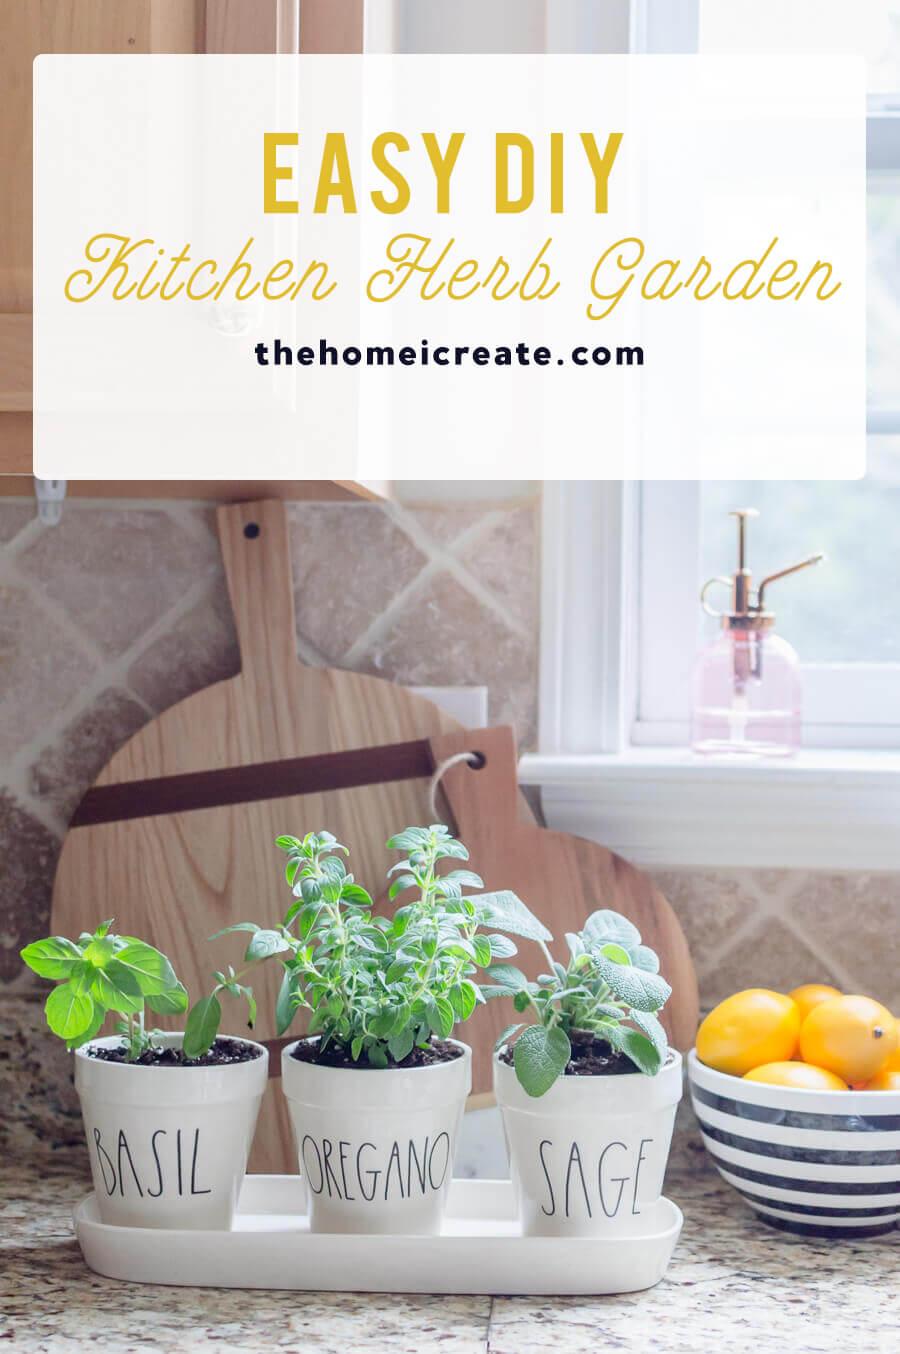 Traditional Easy Diy Kitchen Herb Garden Home I Create Easy Herb Garden Diy garden Easy Herb Garden Ideas